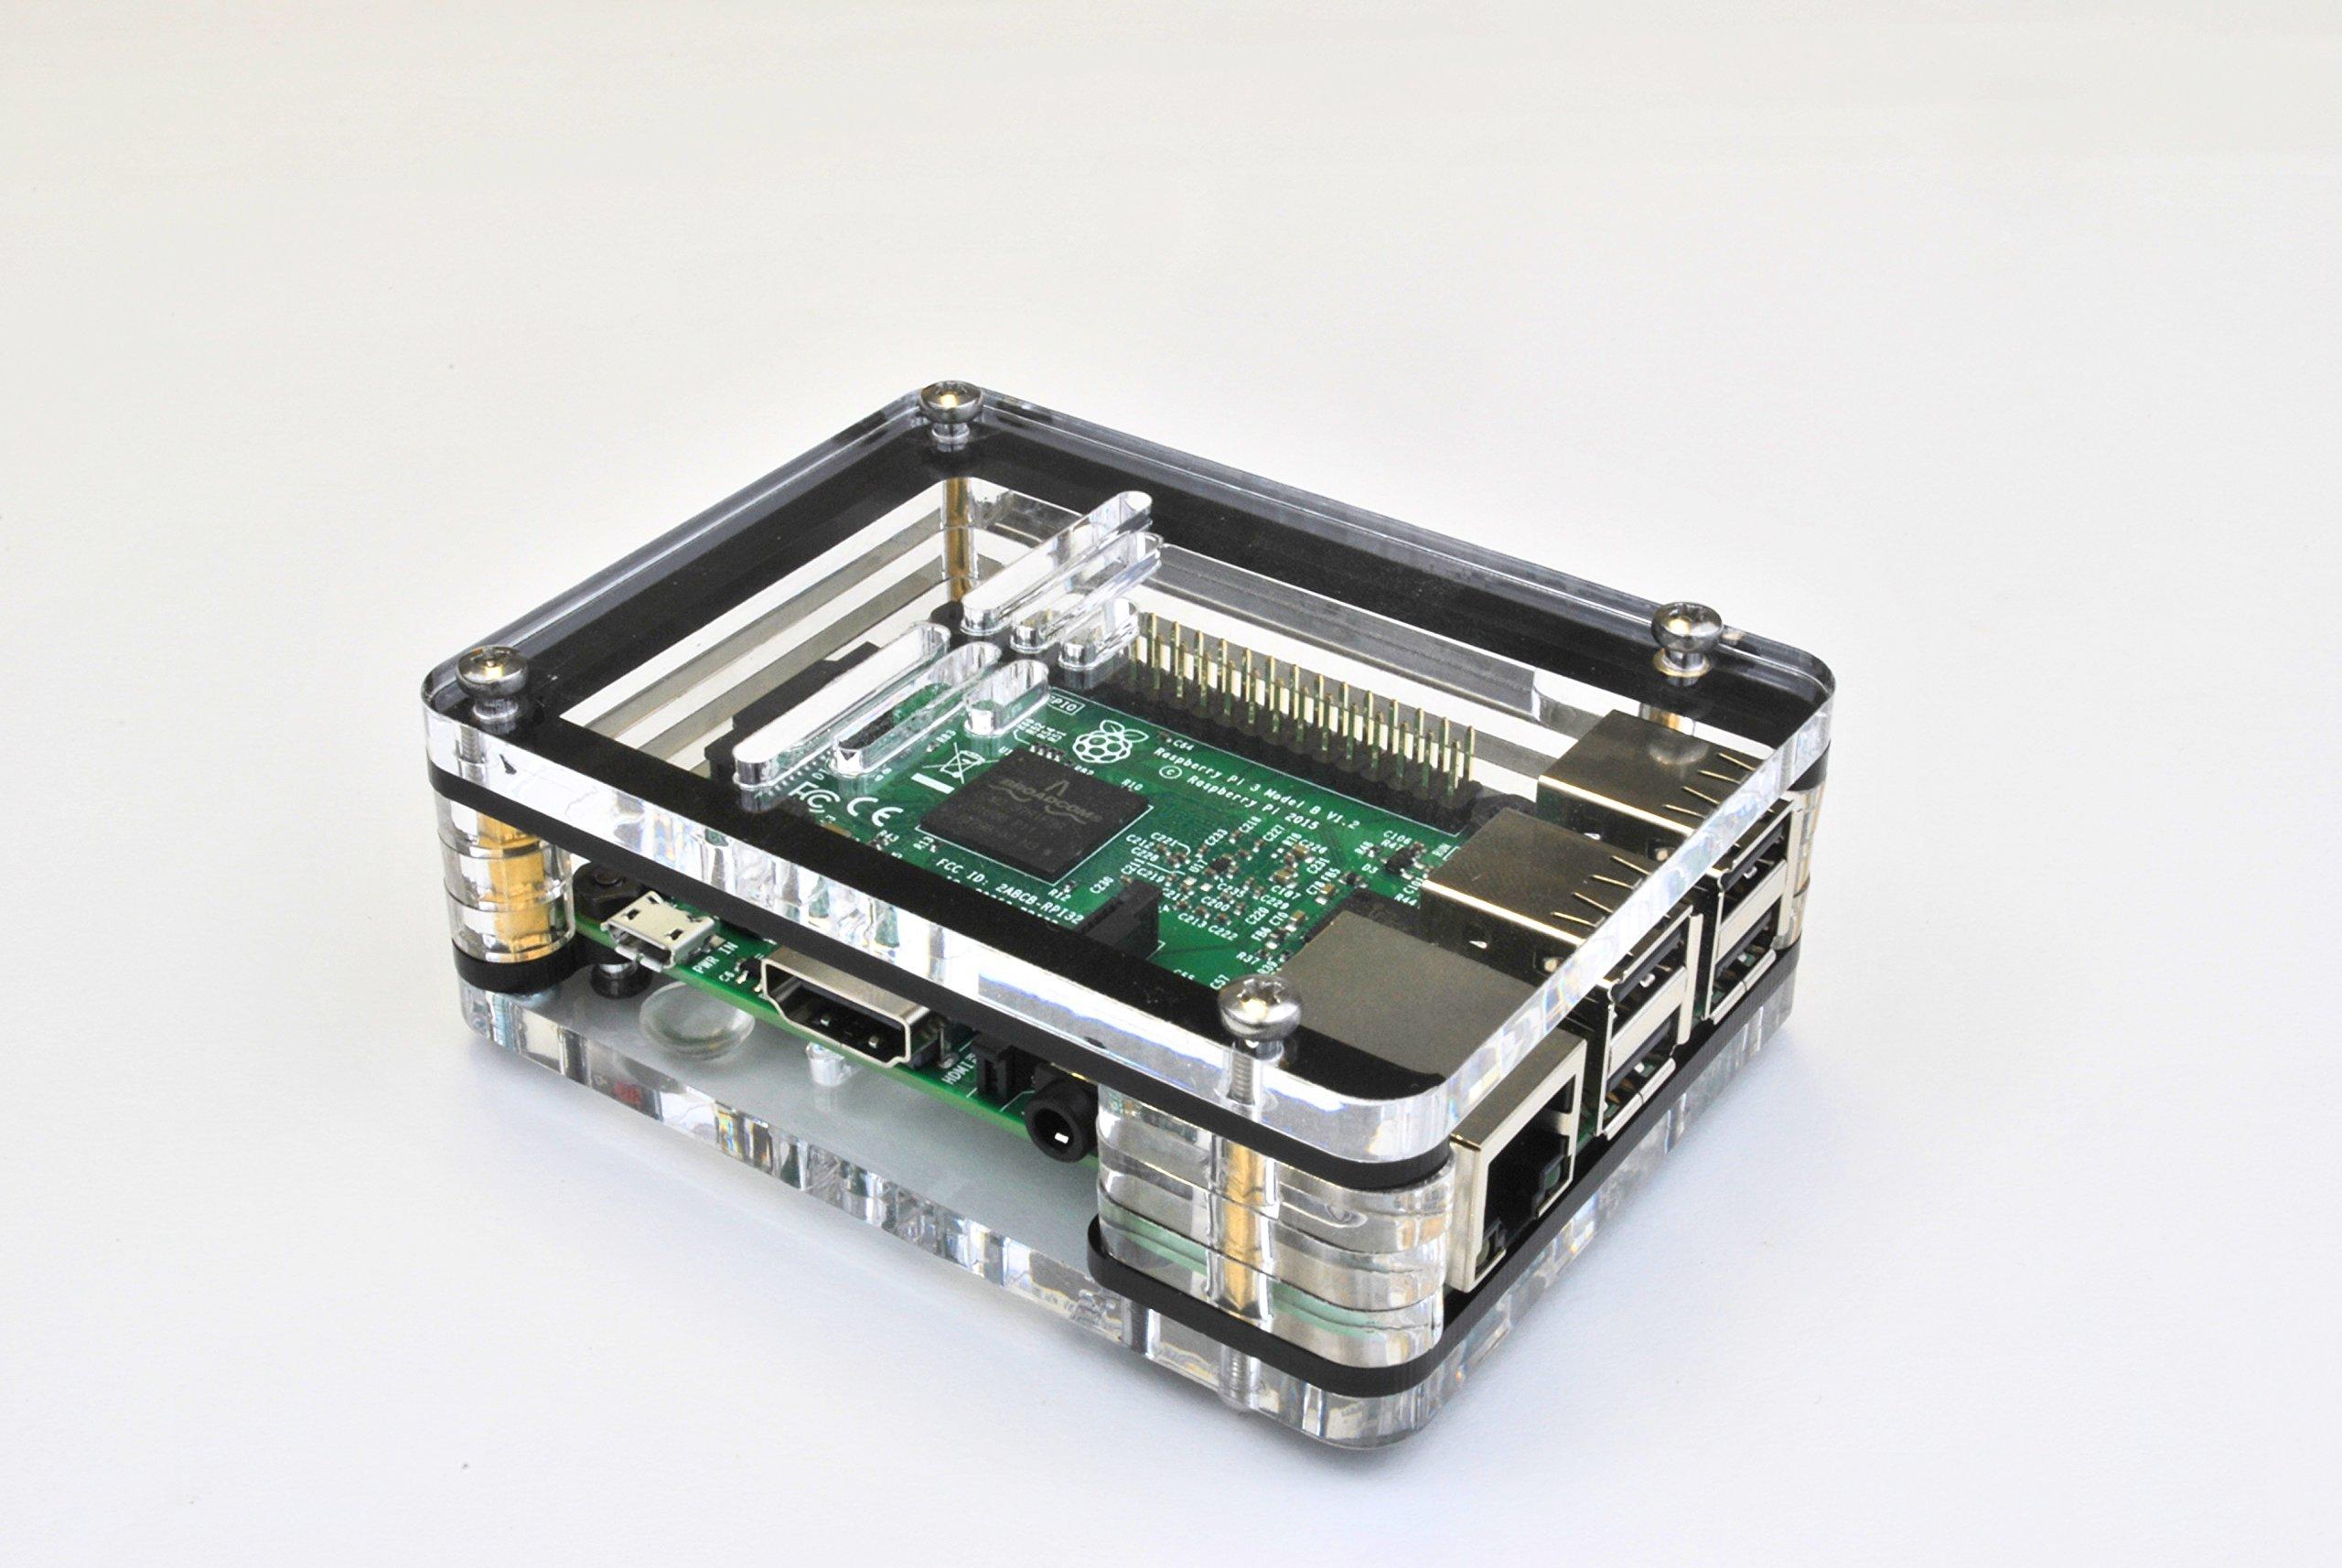 BlackShark Tech SkyCase - Premium Raspberry Pi Case for Pi 3, Pi 2, Pi B+ and 2B (black)